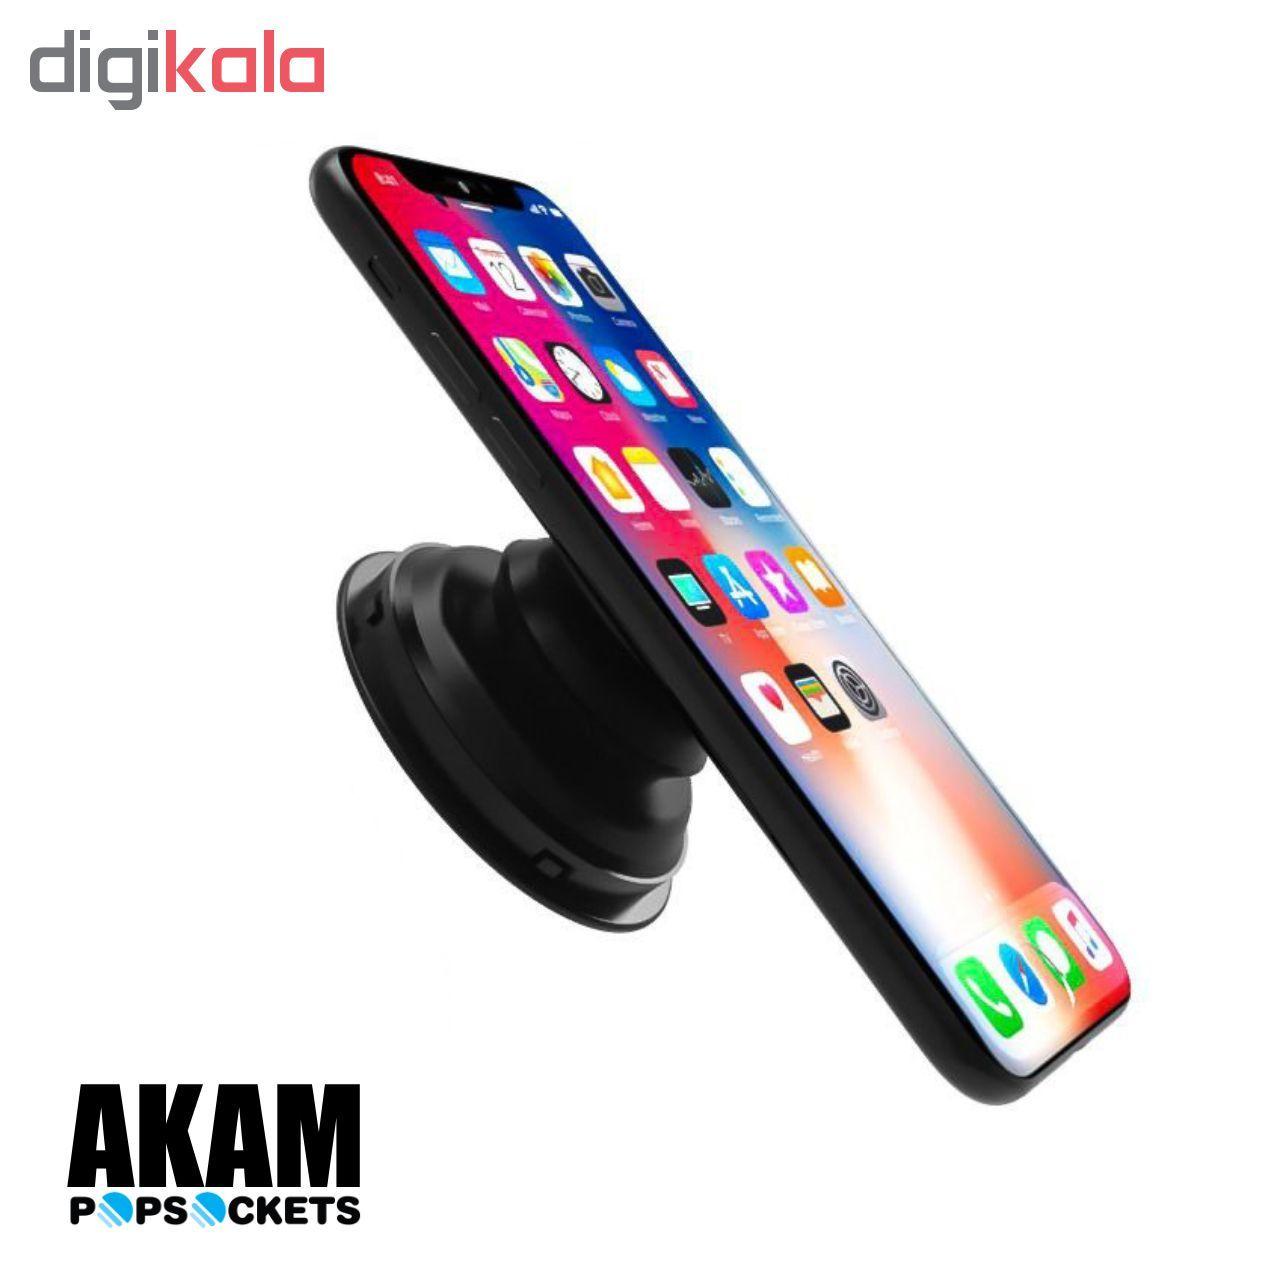 پایه نگهدارنده گوشی موبایل پاپ سوکت آکام مدل APS0068 main 1 7